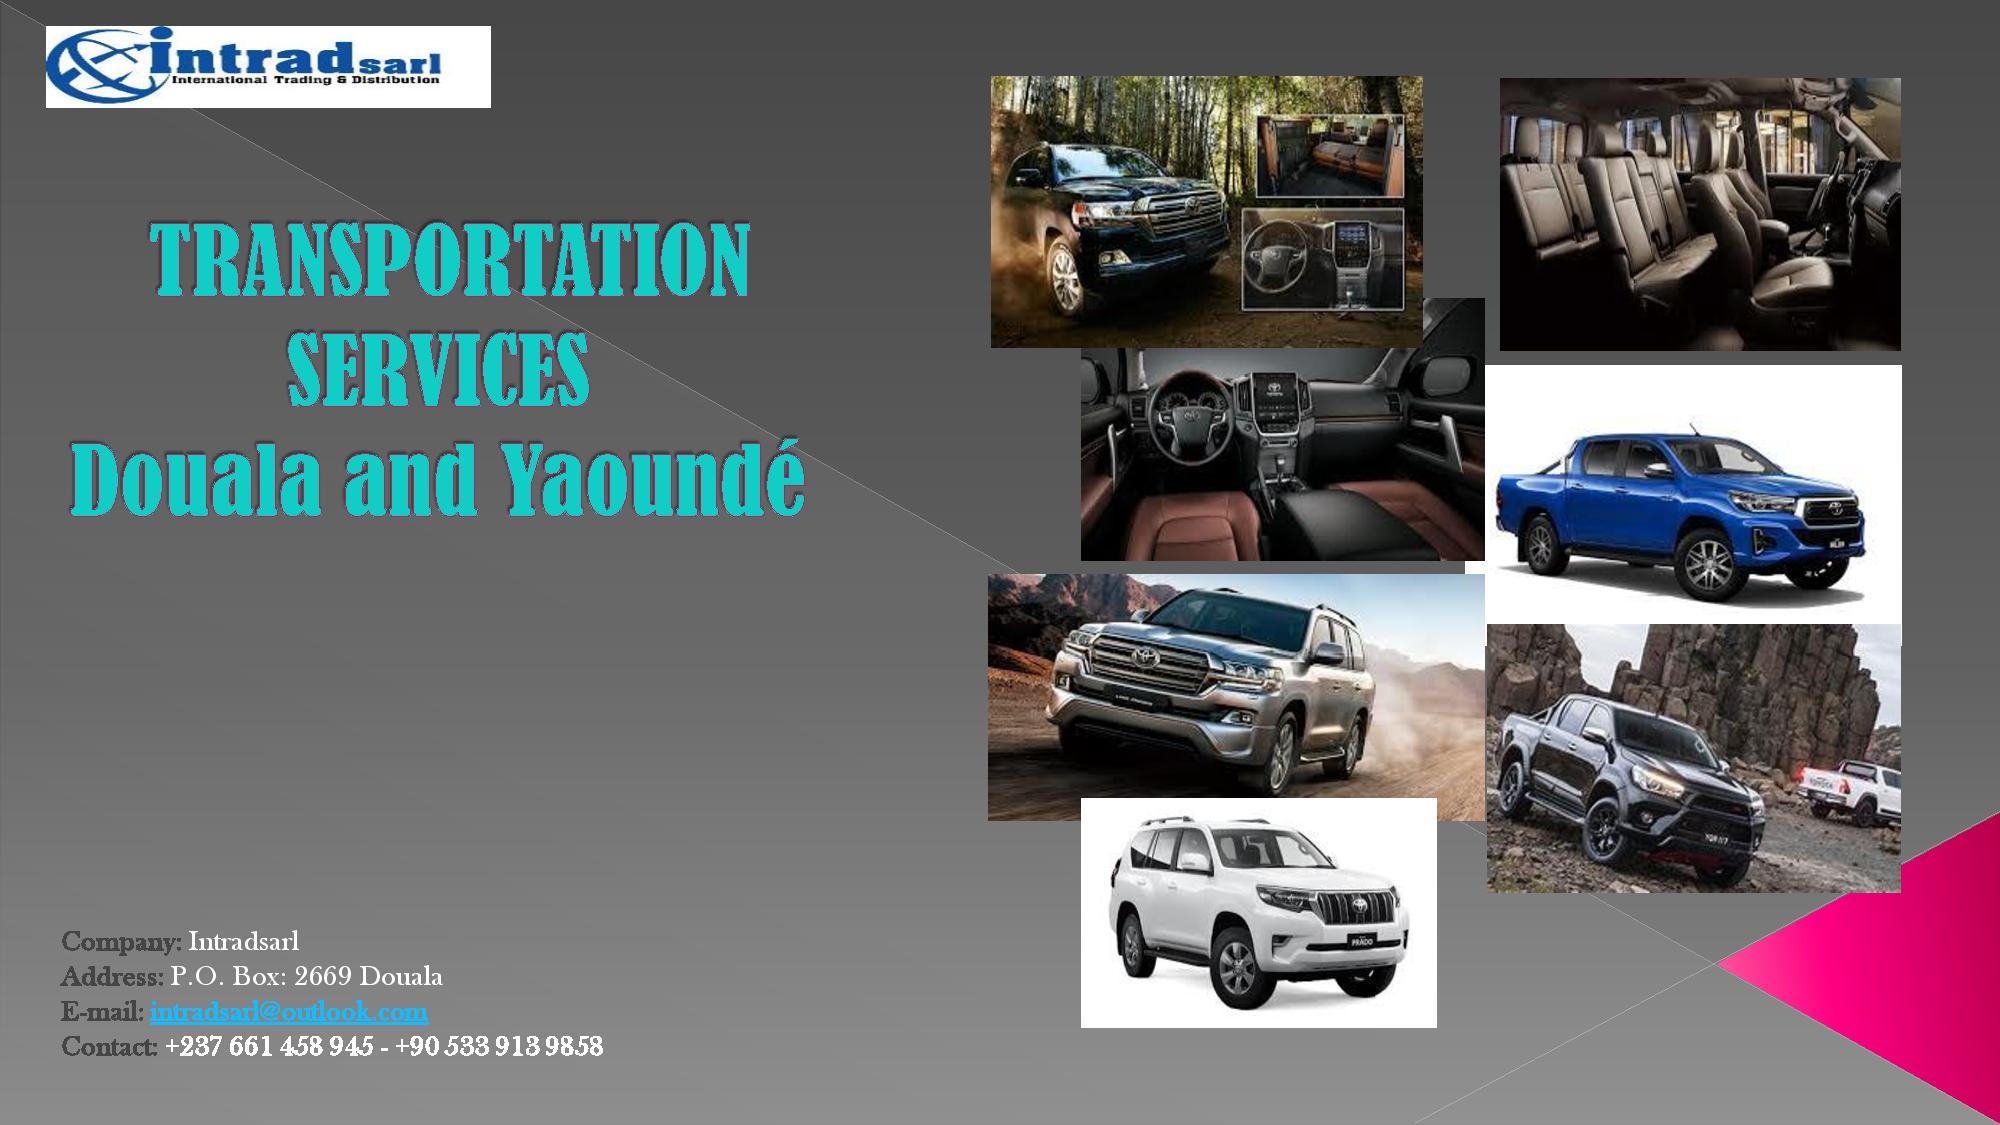 Intrad Sarl transportation-page-001